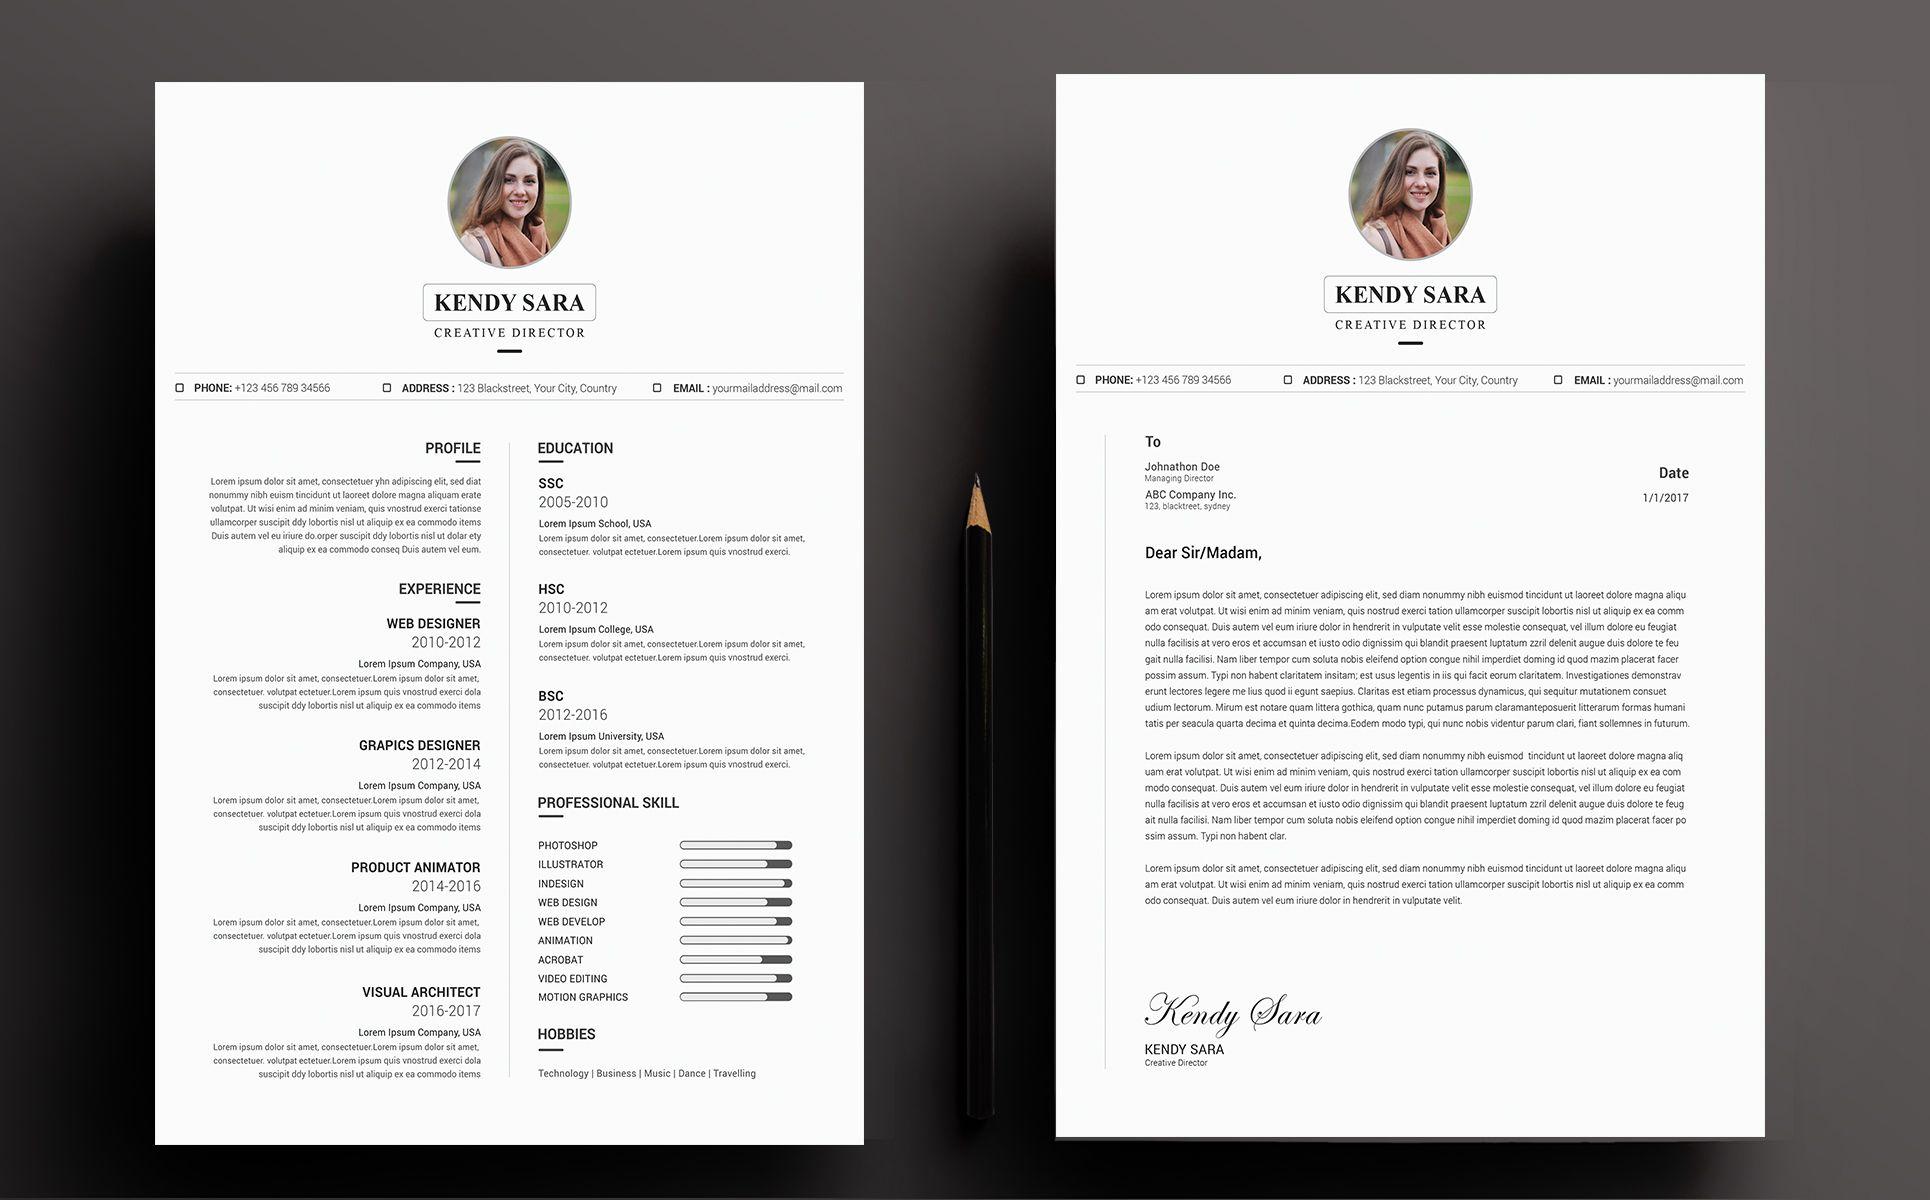 Kendy Sara Resume Template 71126 Templatemonster Resume Template Creative Director Cv Cv Resume Template